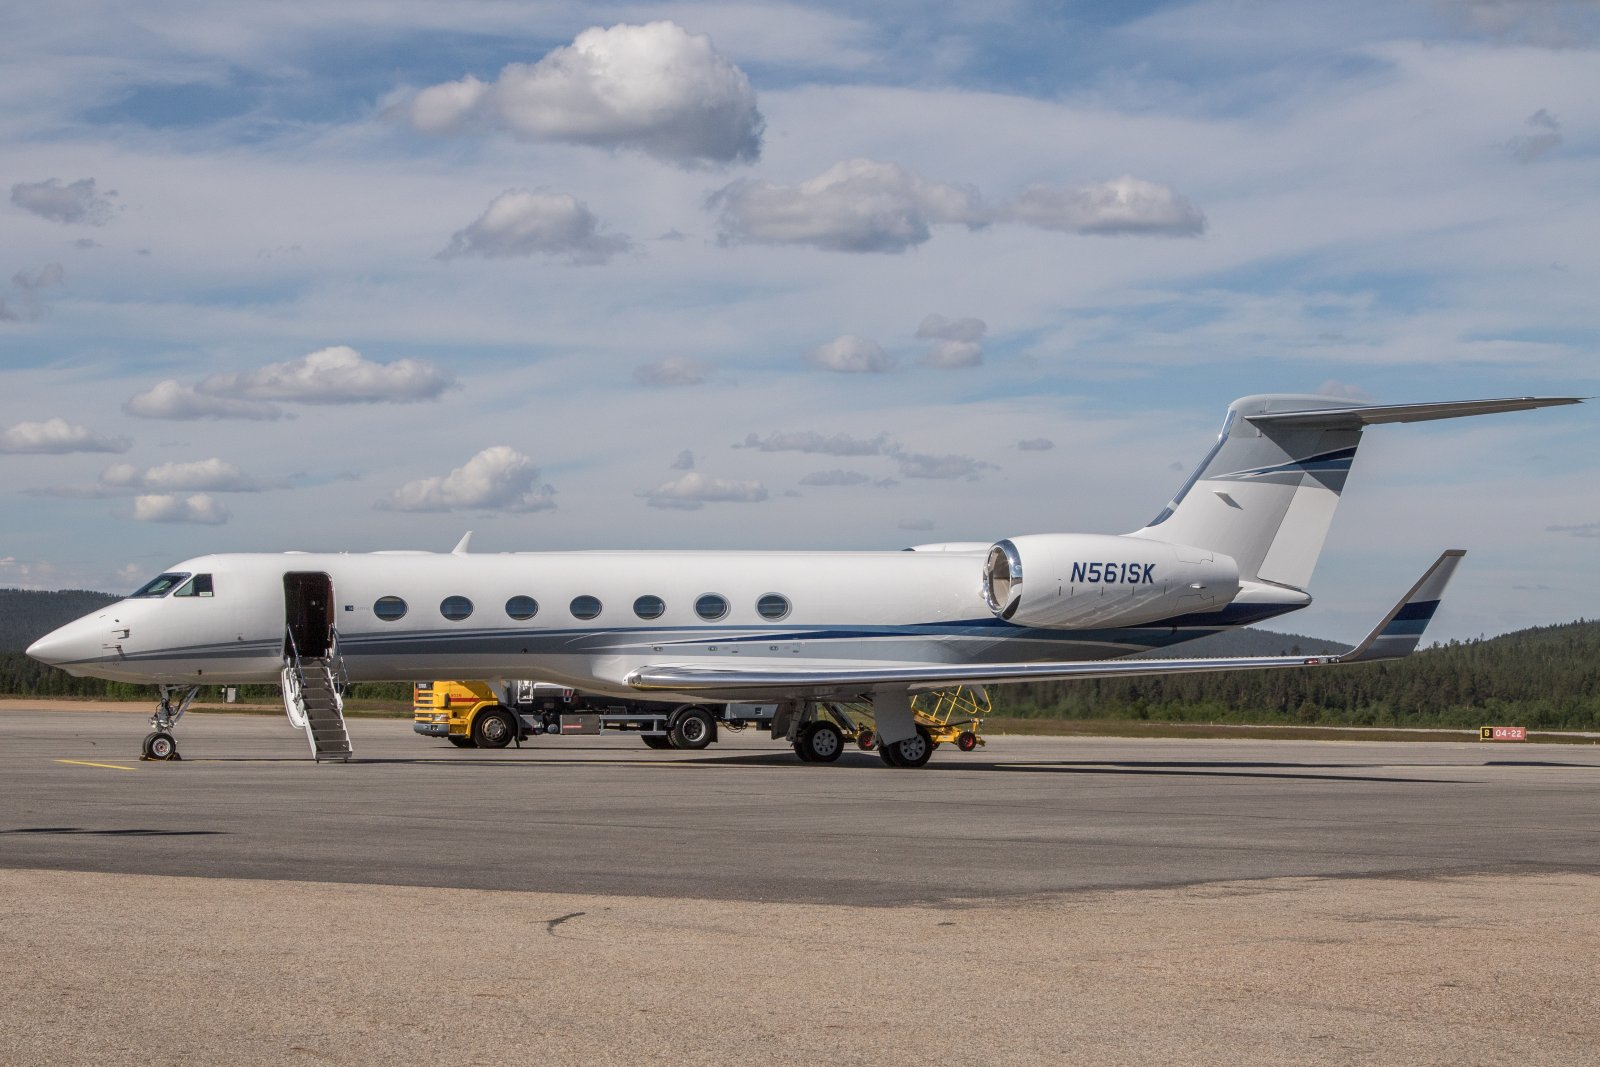 N561SK. Gulfstream Aerospace GV-SP. 10.7 Teterborosta suoraan Ivaloon.